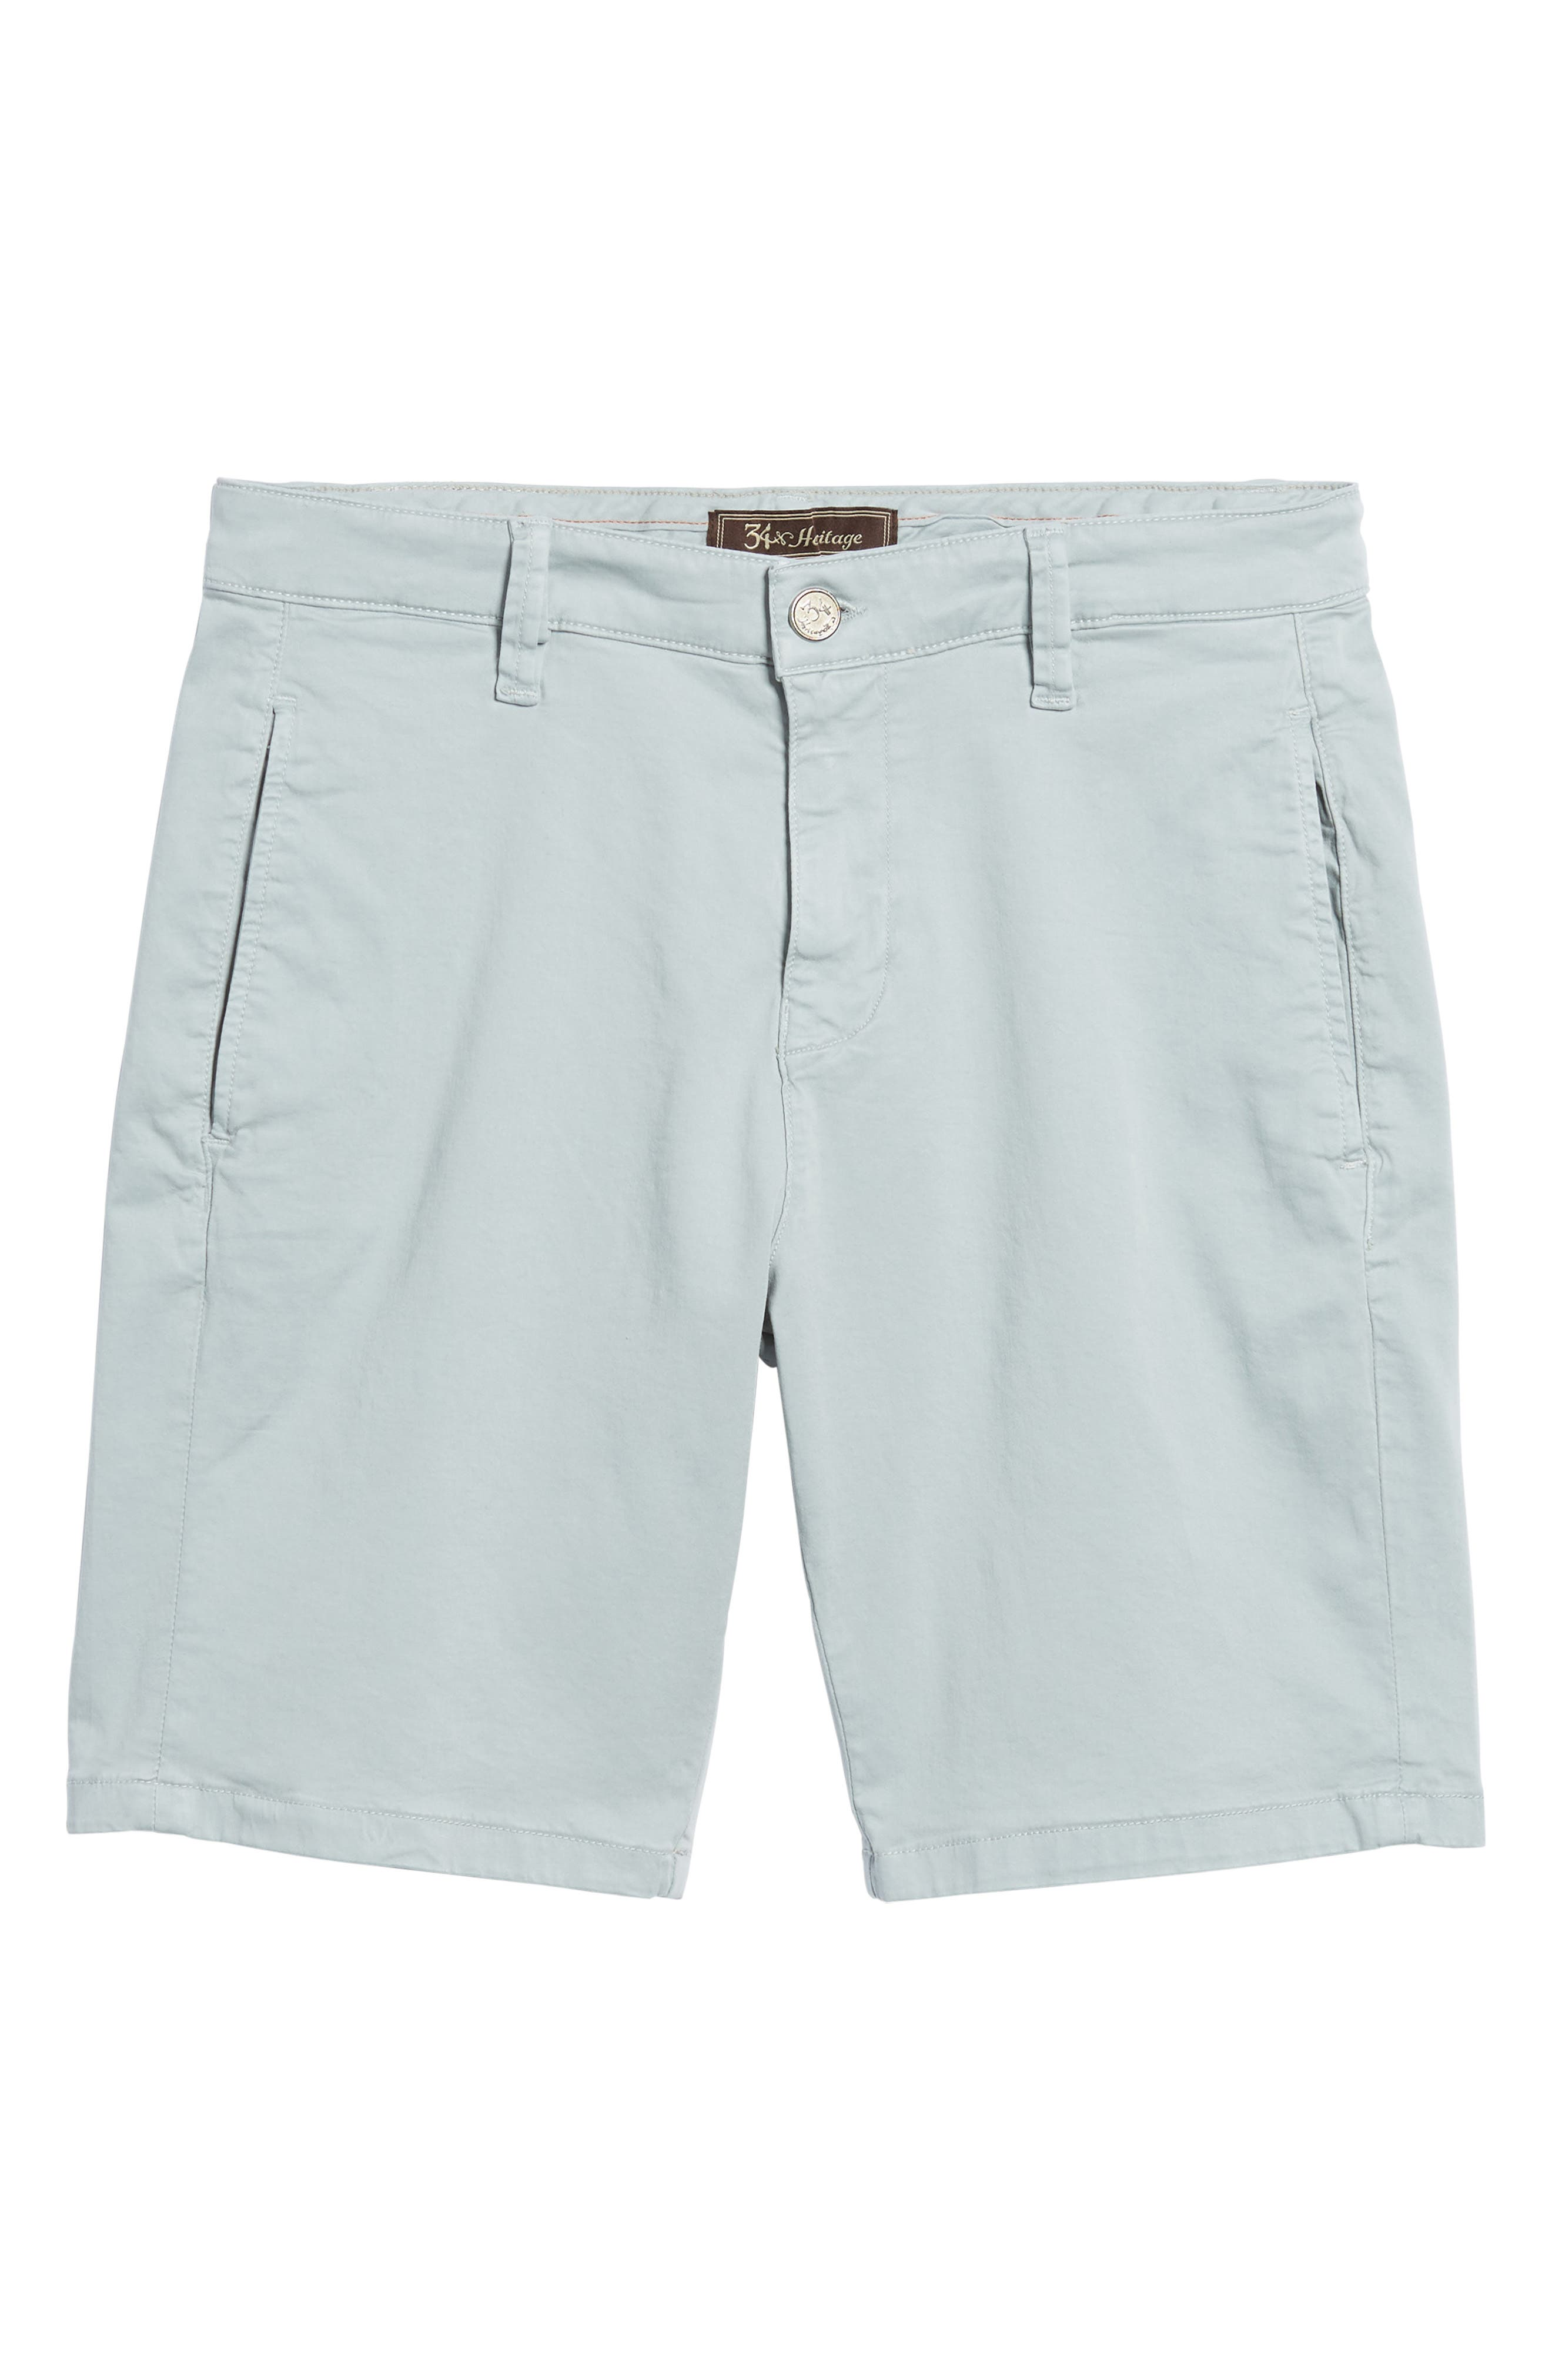 Nevada Twill Shorts,                             Alternate thumbnail 6, color,                             ICE TWILL